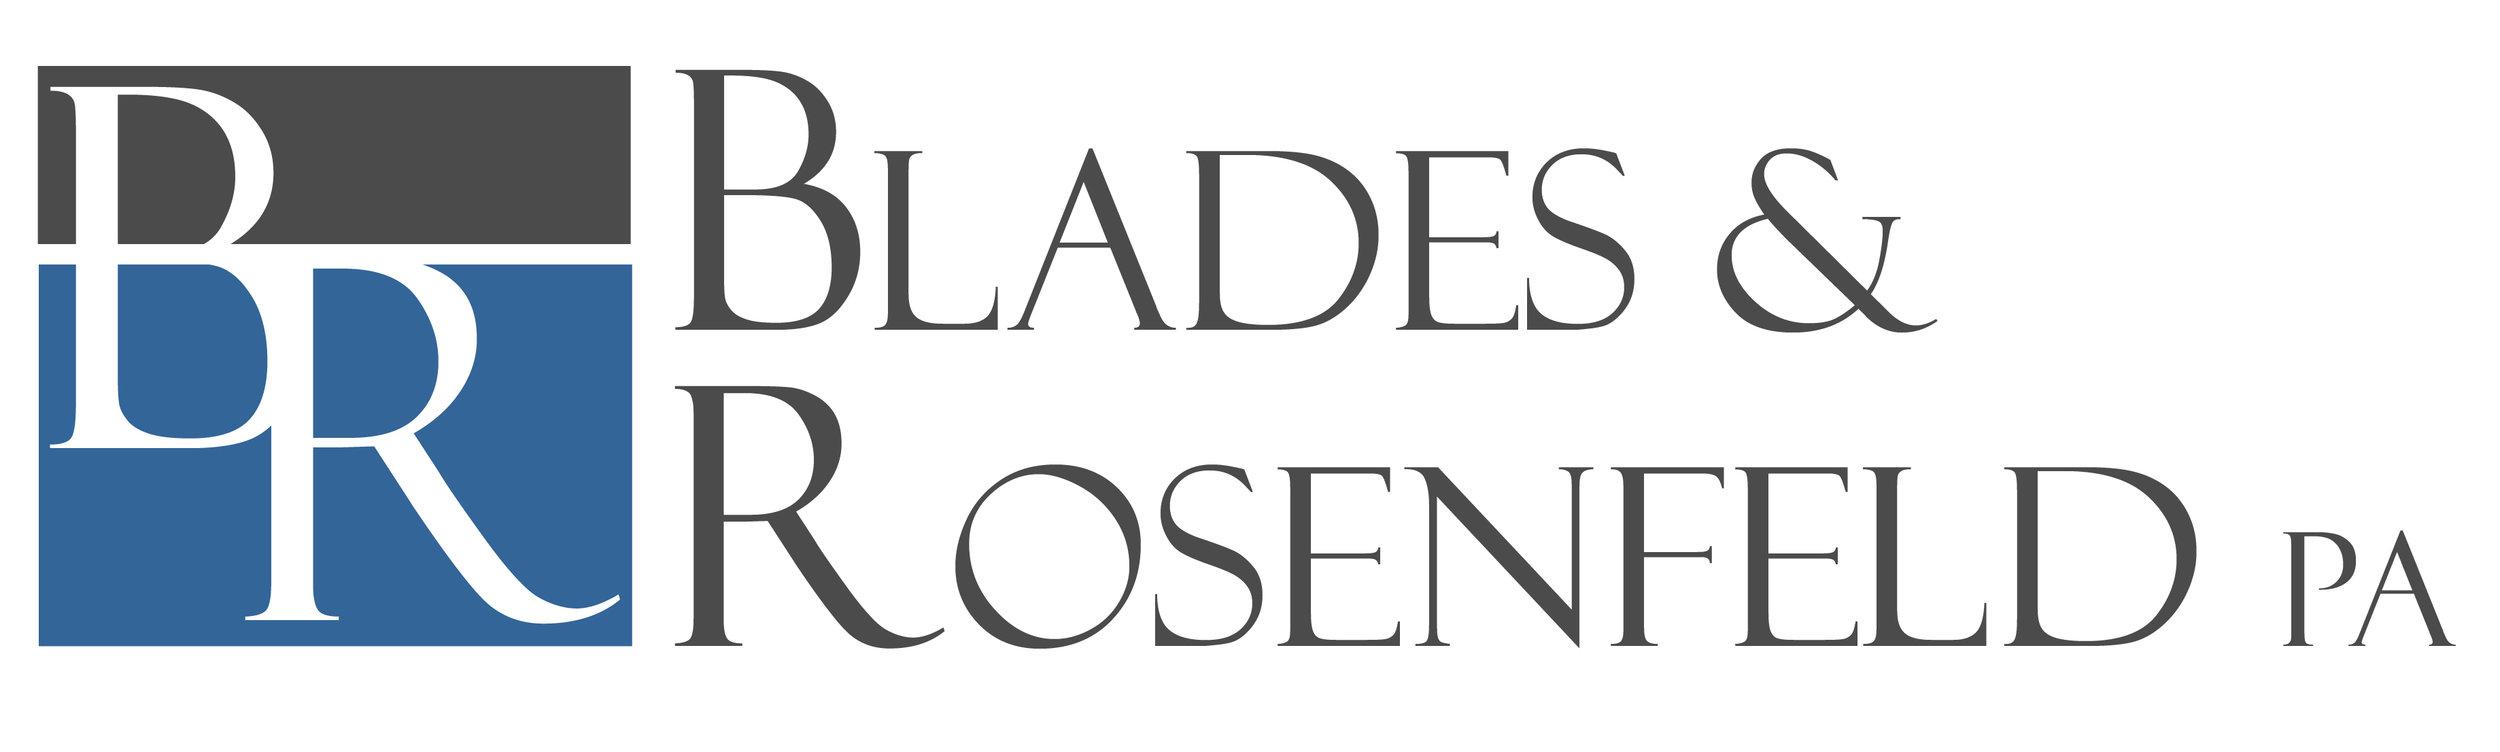 BladesRosenf Final Logo.jpg